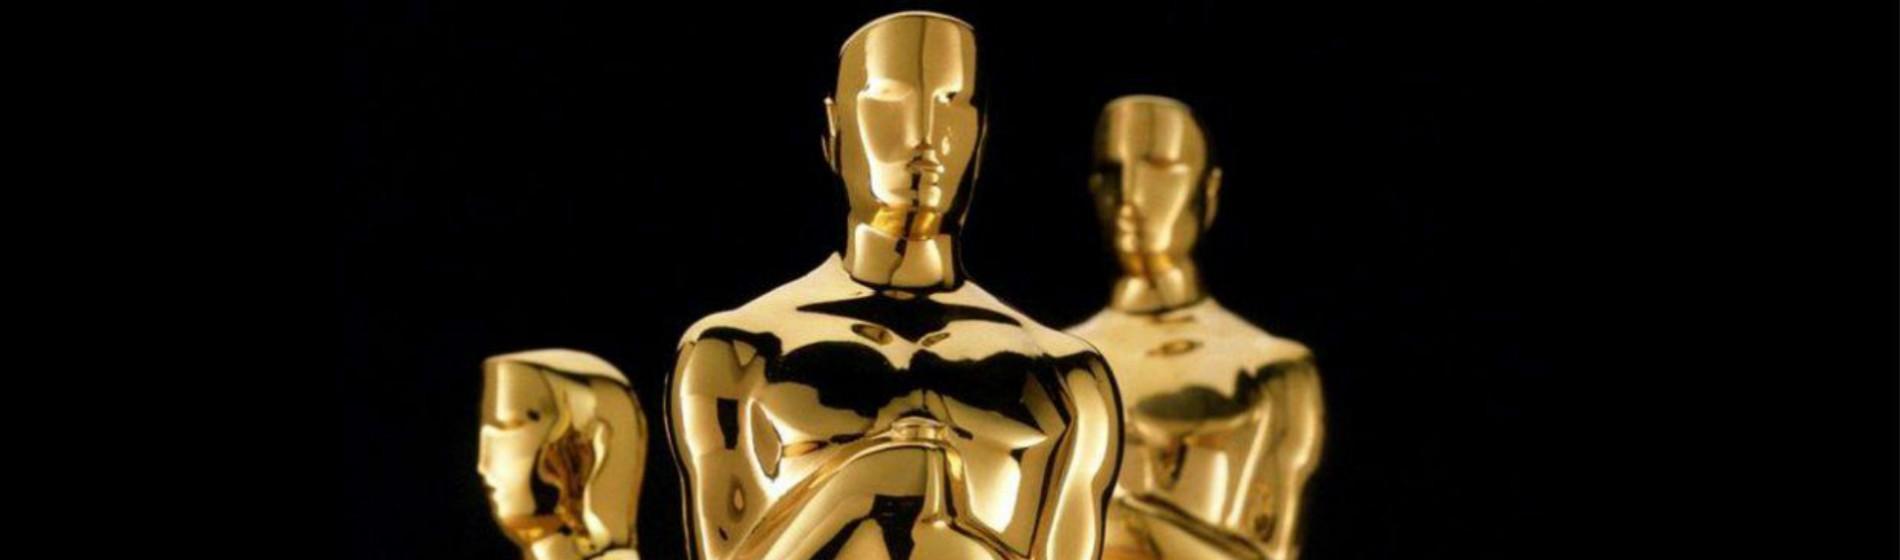 Oscar Nominations 2019: The Full List - That Shelf